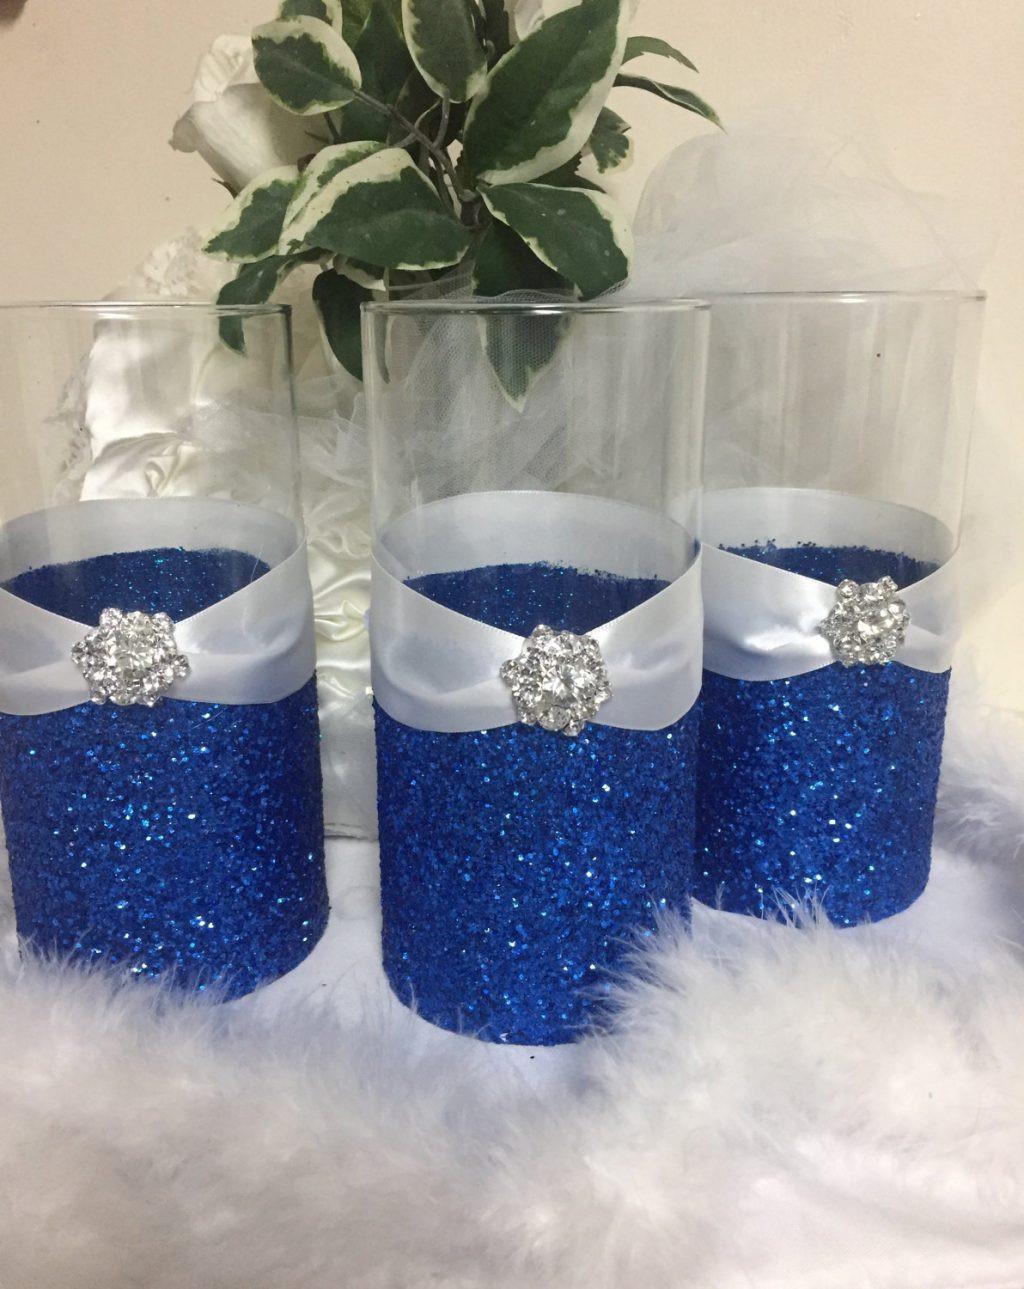 galle cameo glass vase of navy blue vases gallery tallh vases glitter vase centerpiece diy with navy blue vases gallery tallh vases glitter vase centerpiece diy vasei 0d ball for design